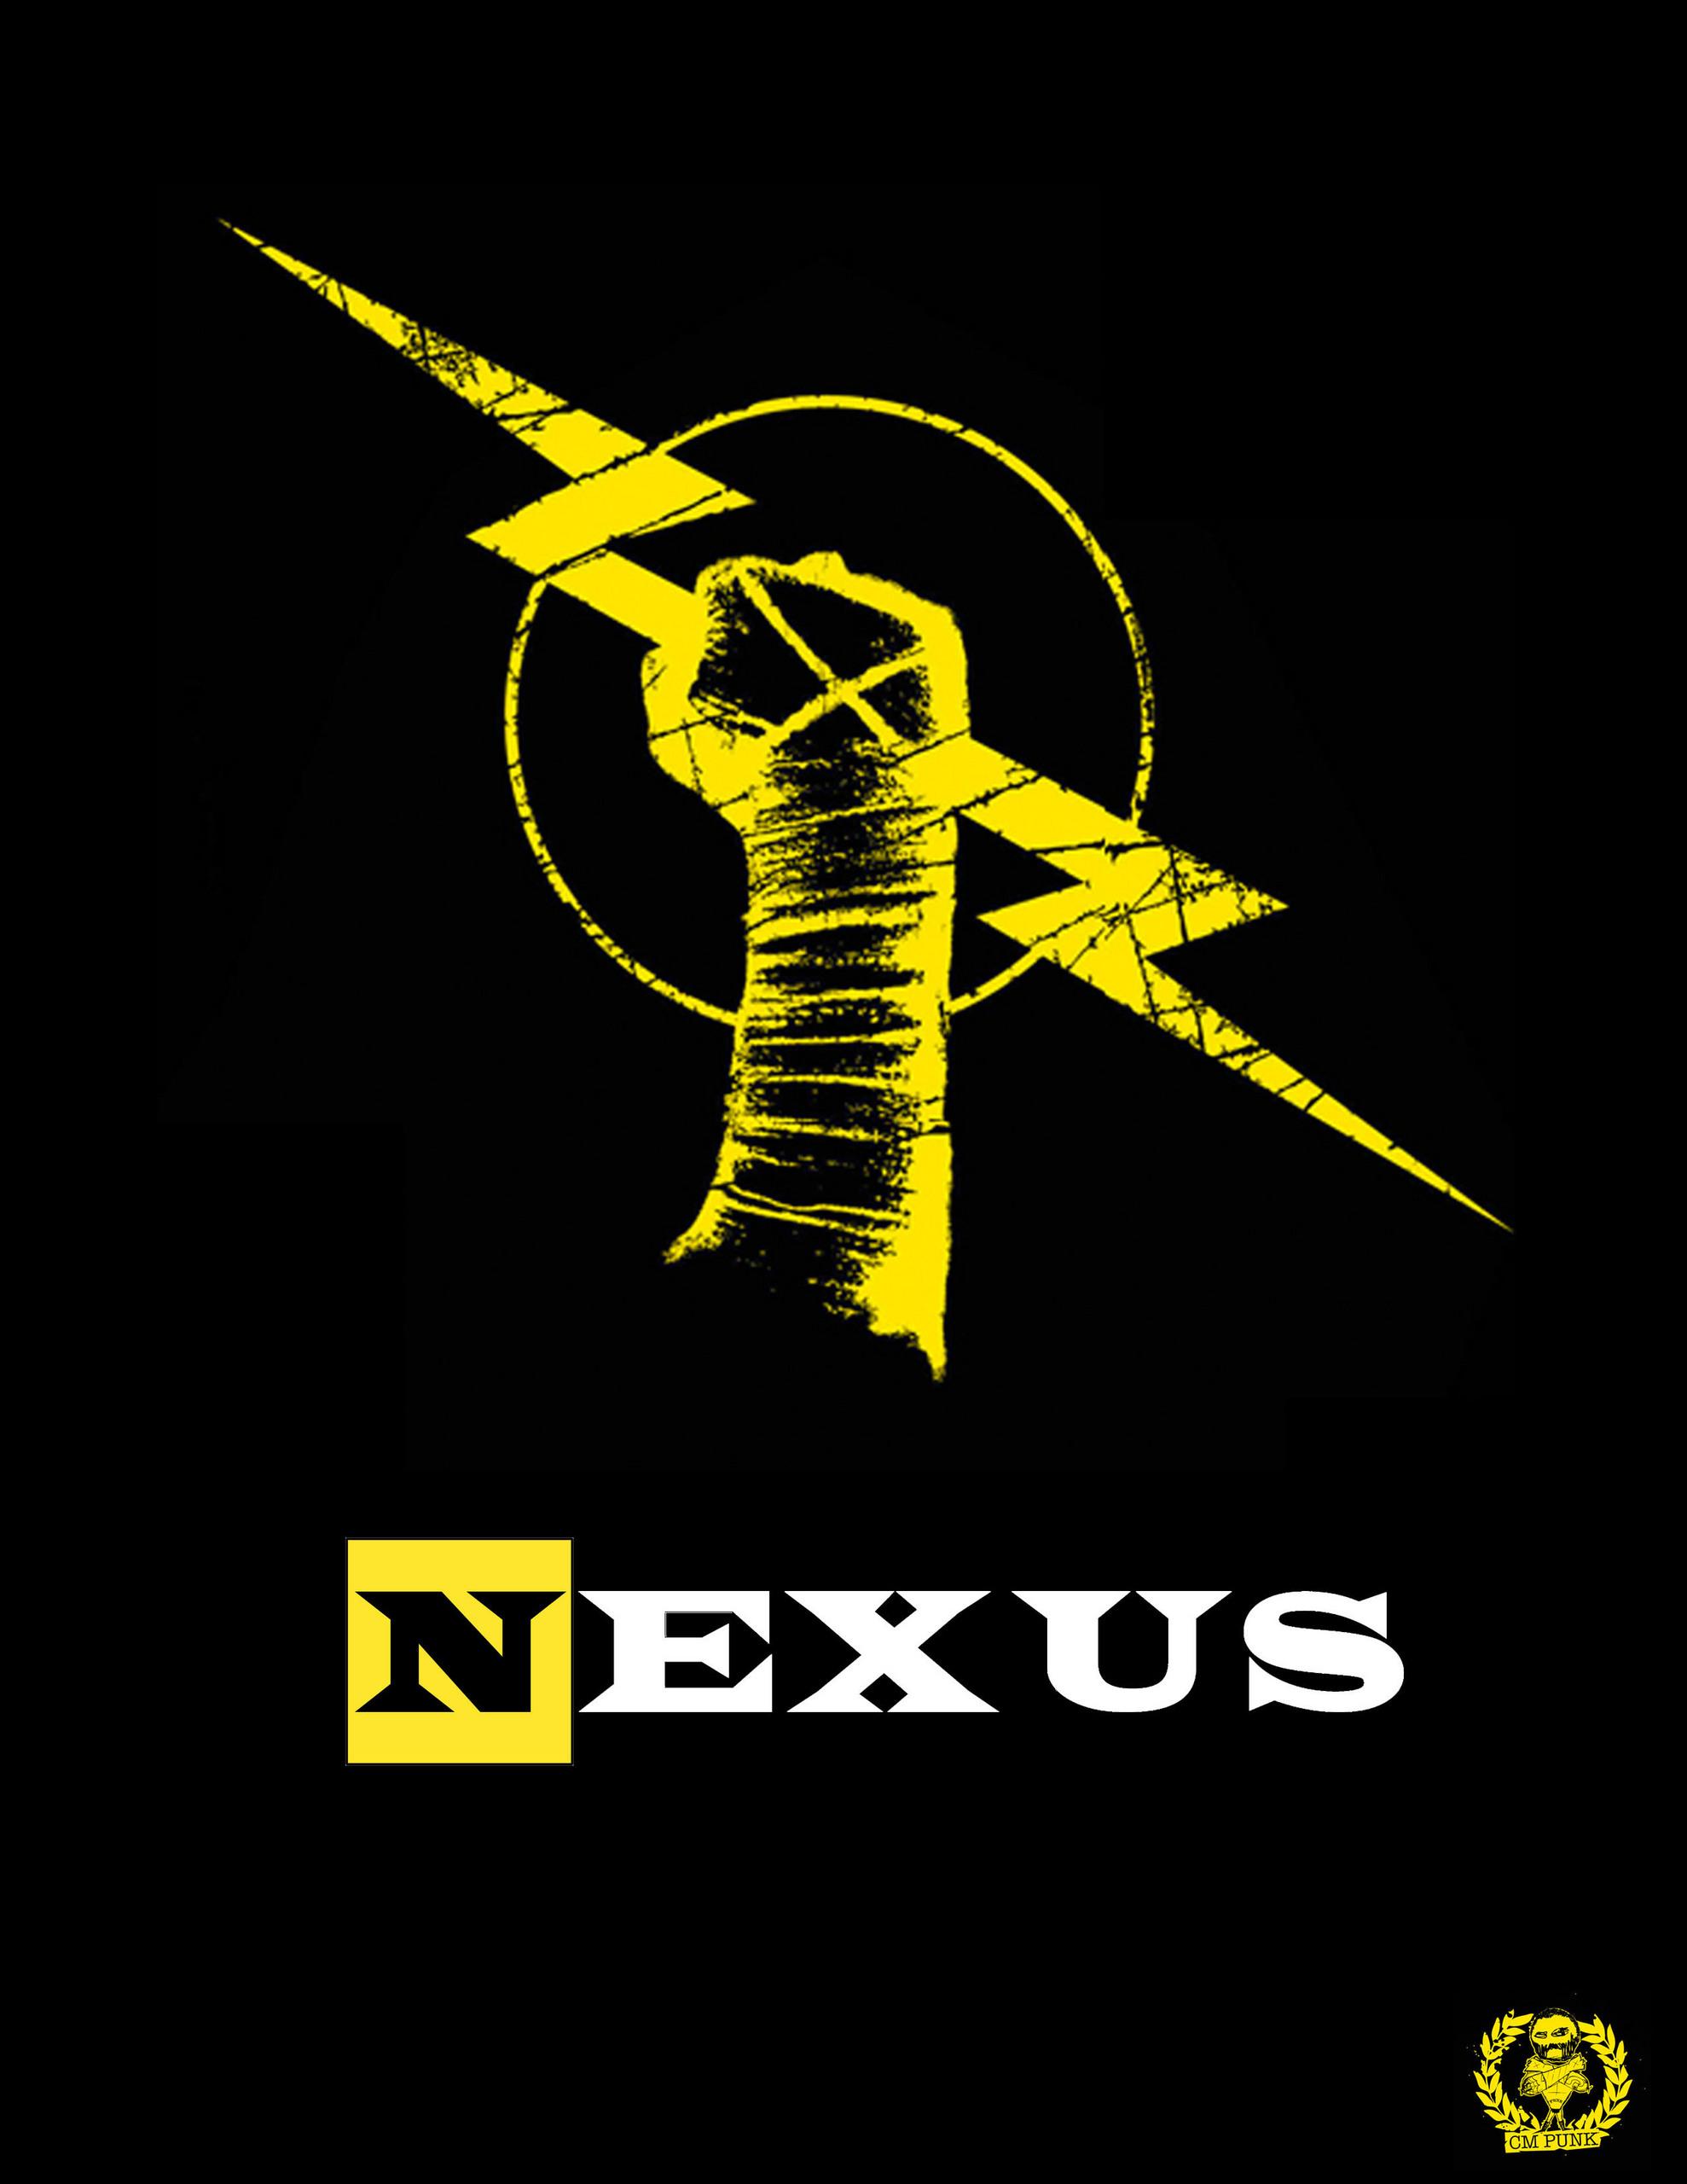 Pictures of CM Punk Nexus Logo 1 Pictures Of CM Punk 1978x2560